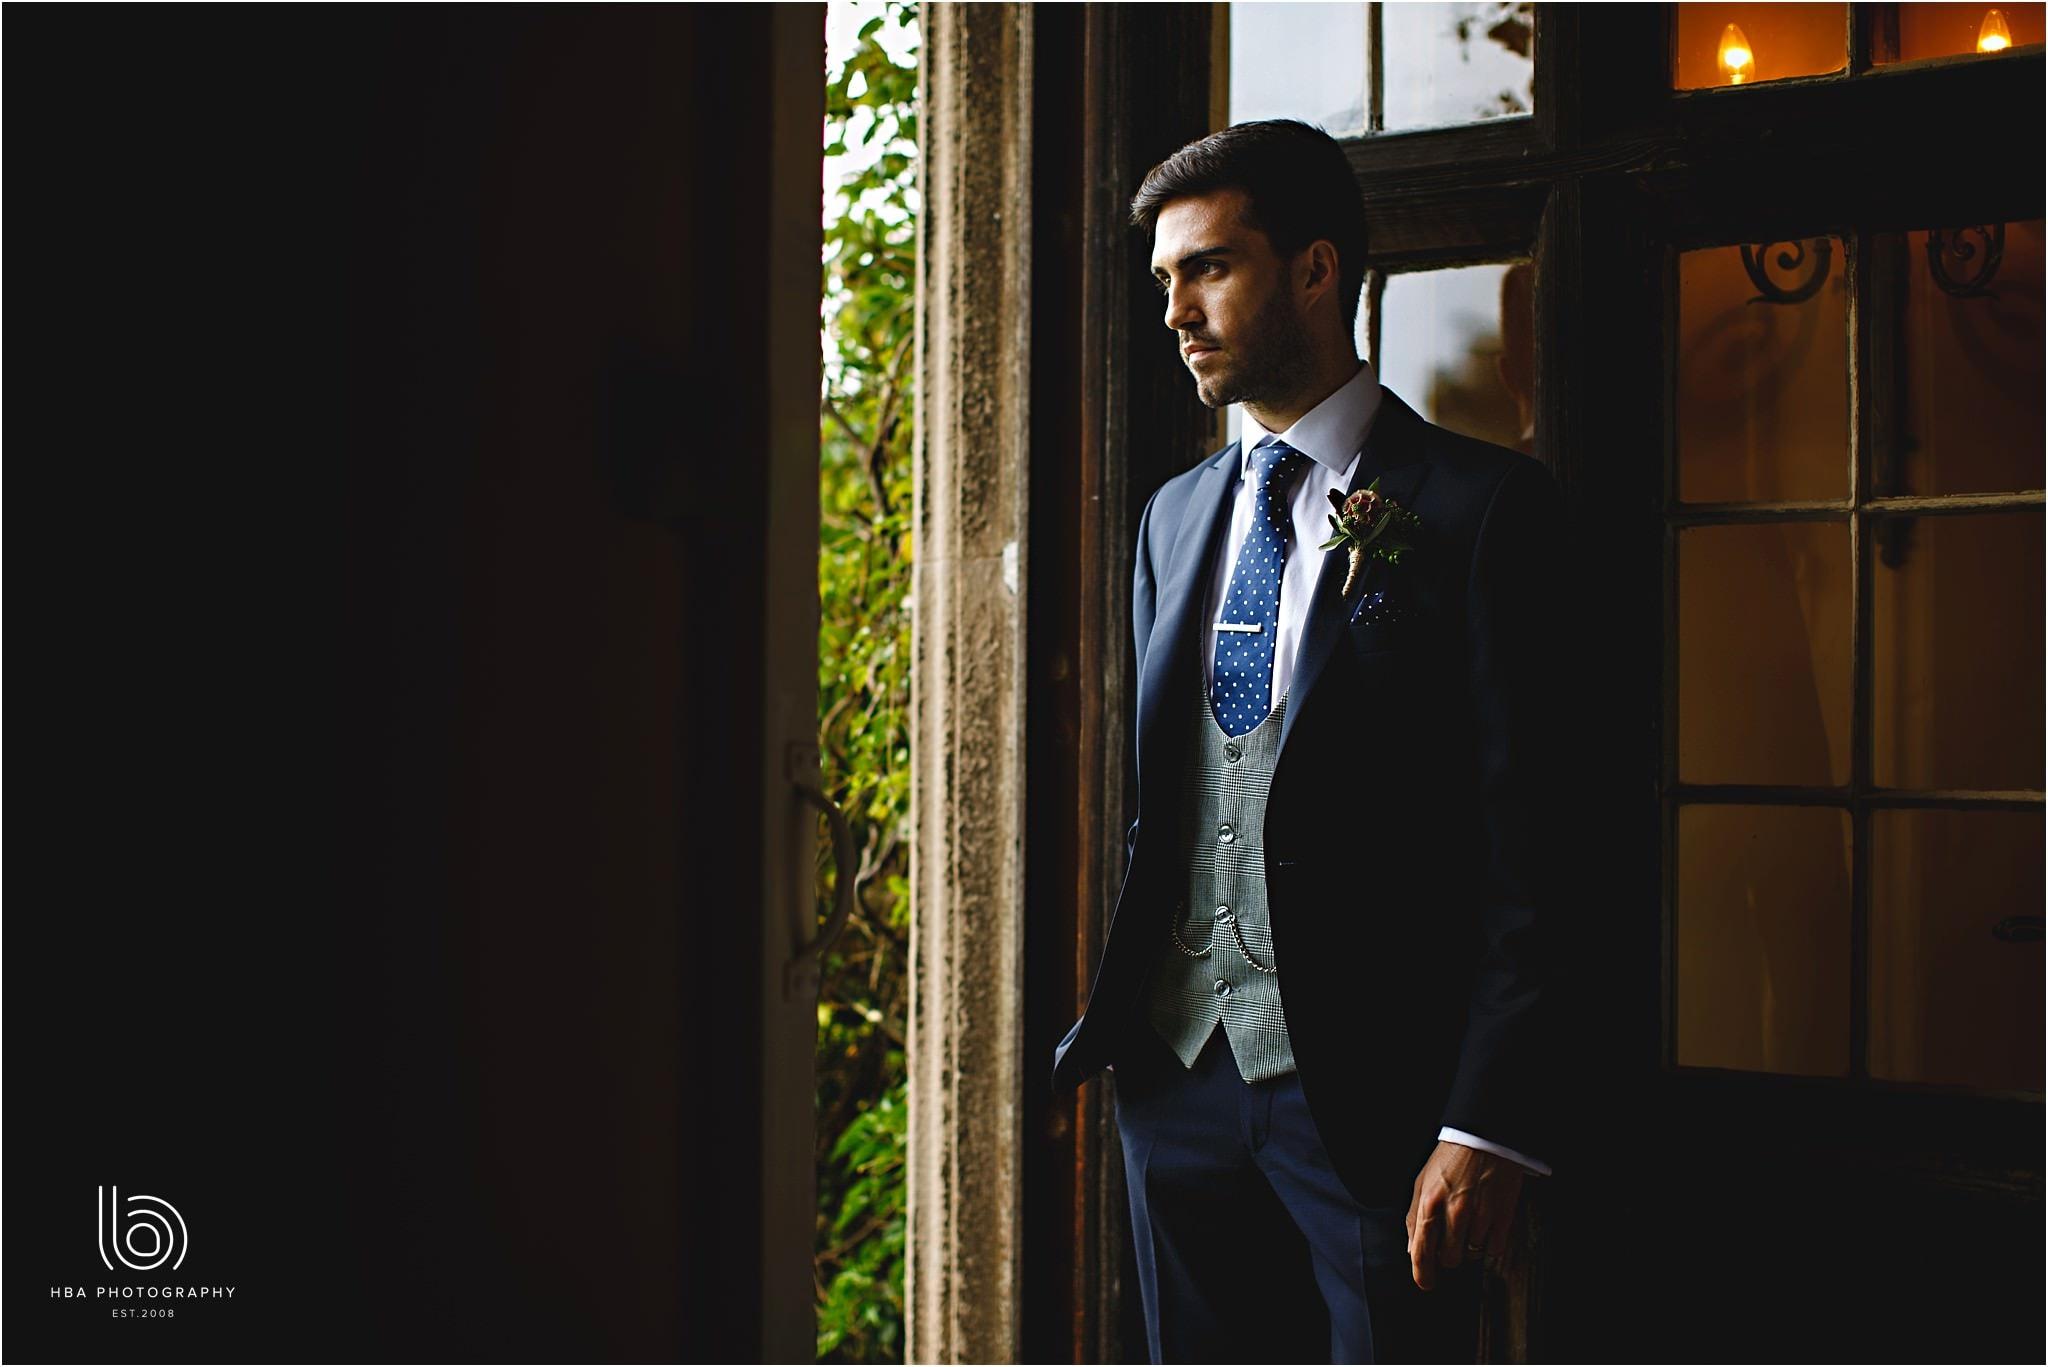 the groom stood in the doorway looking cool in his suit